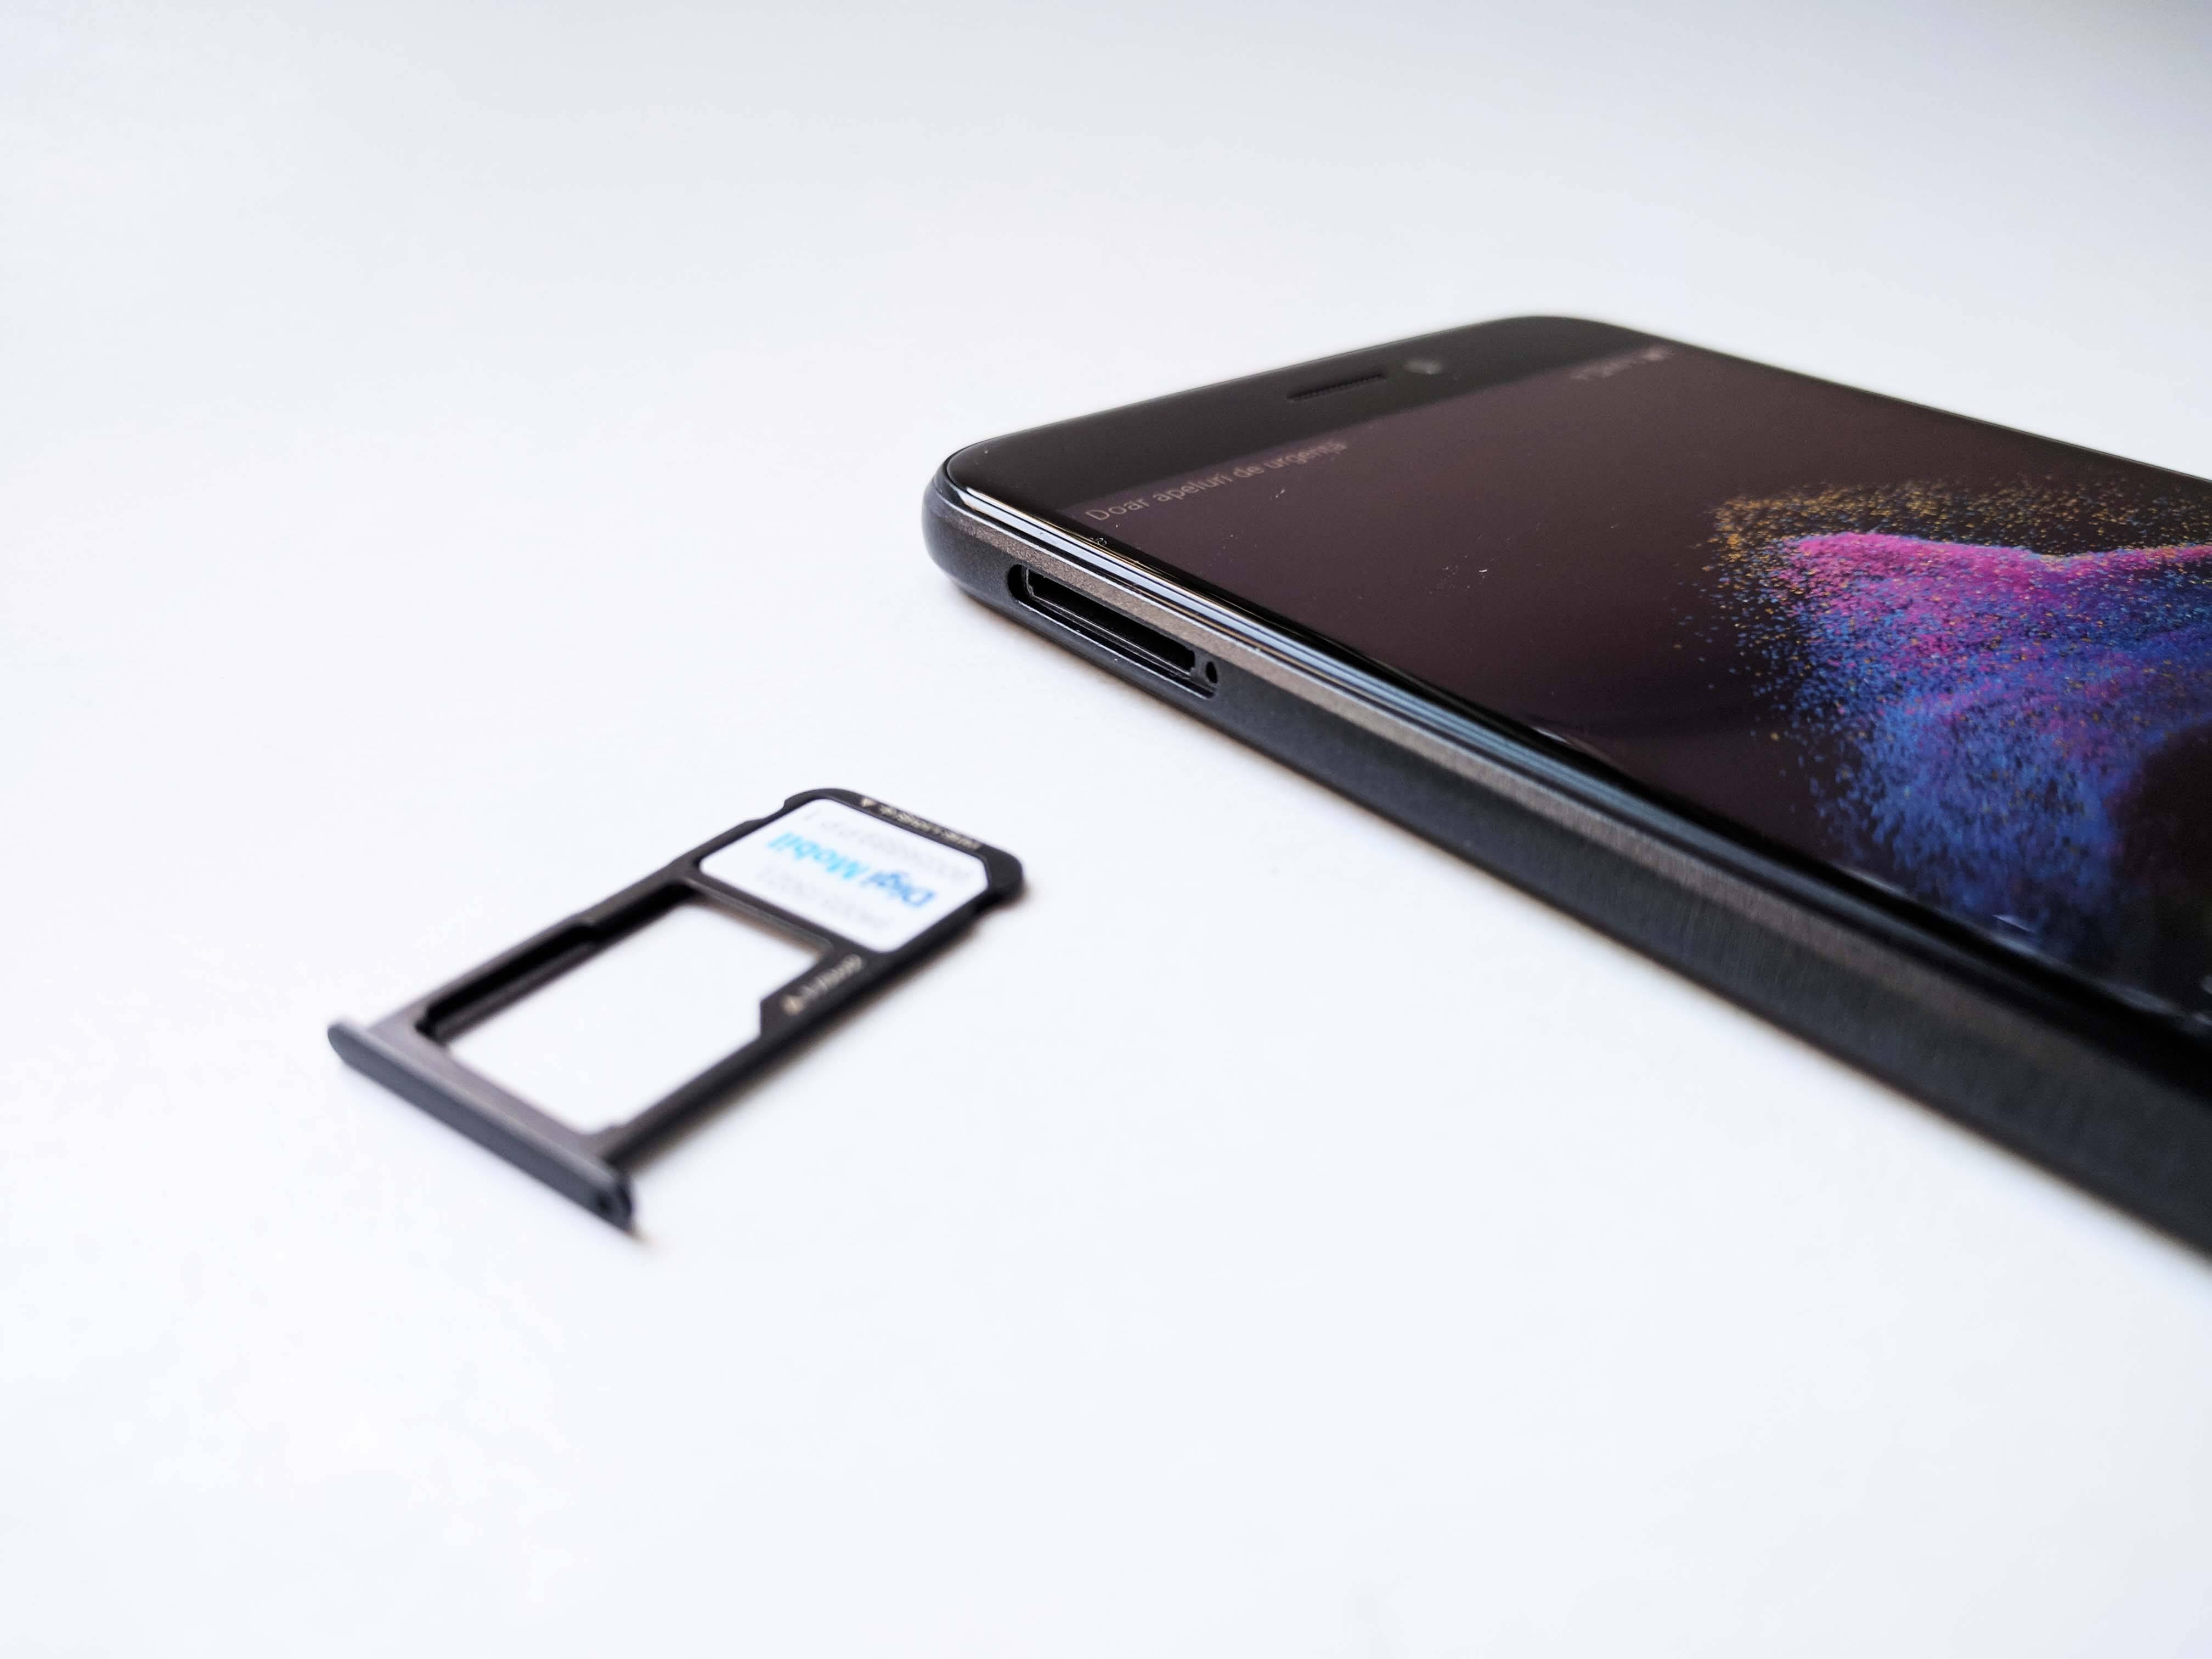 Huawei P9 Lite (2017) Review Romana, Pareri - Foto 6